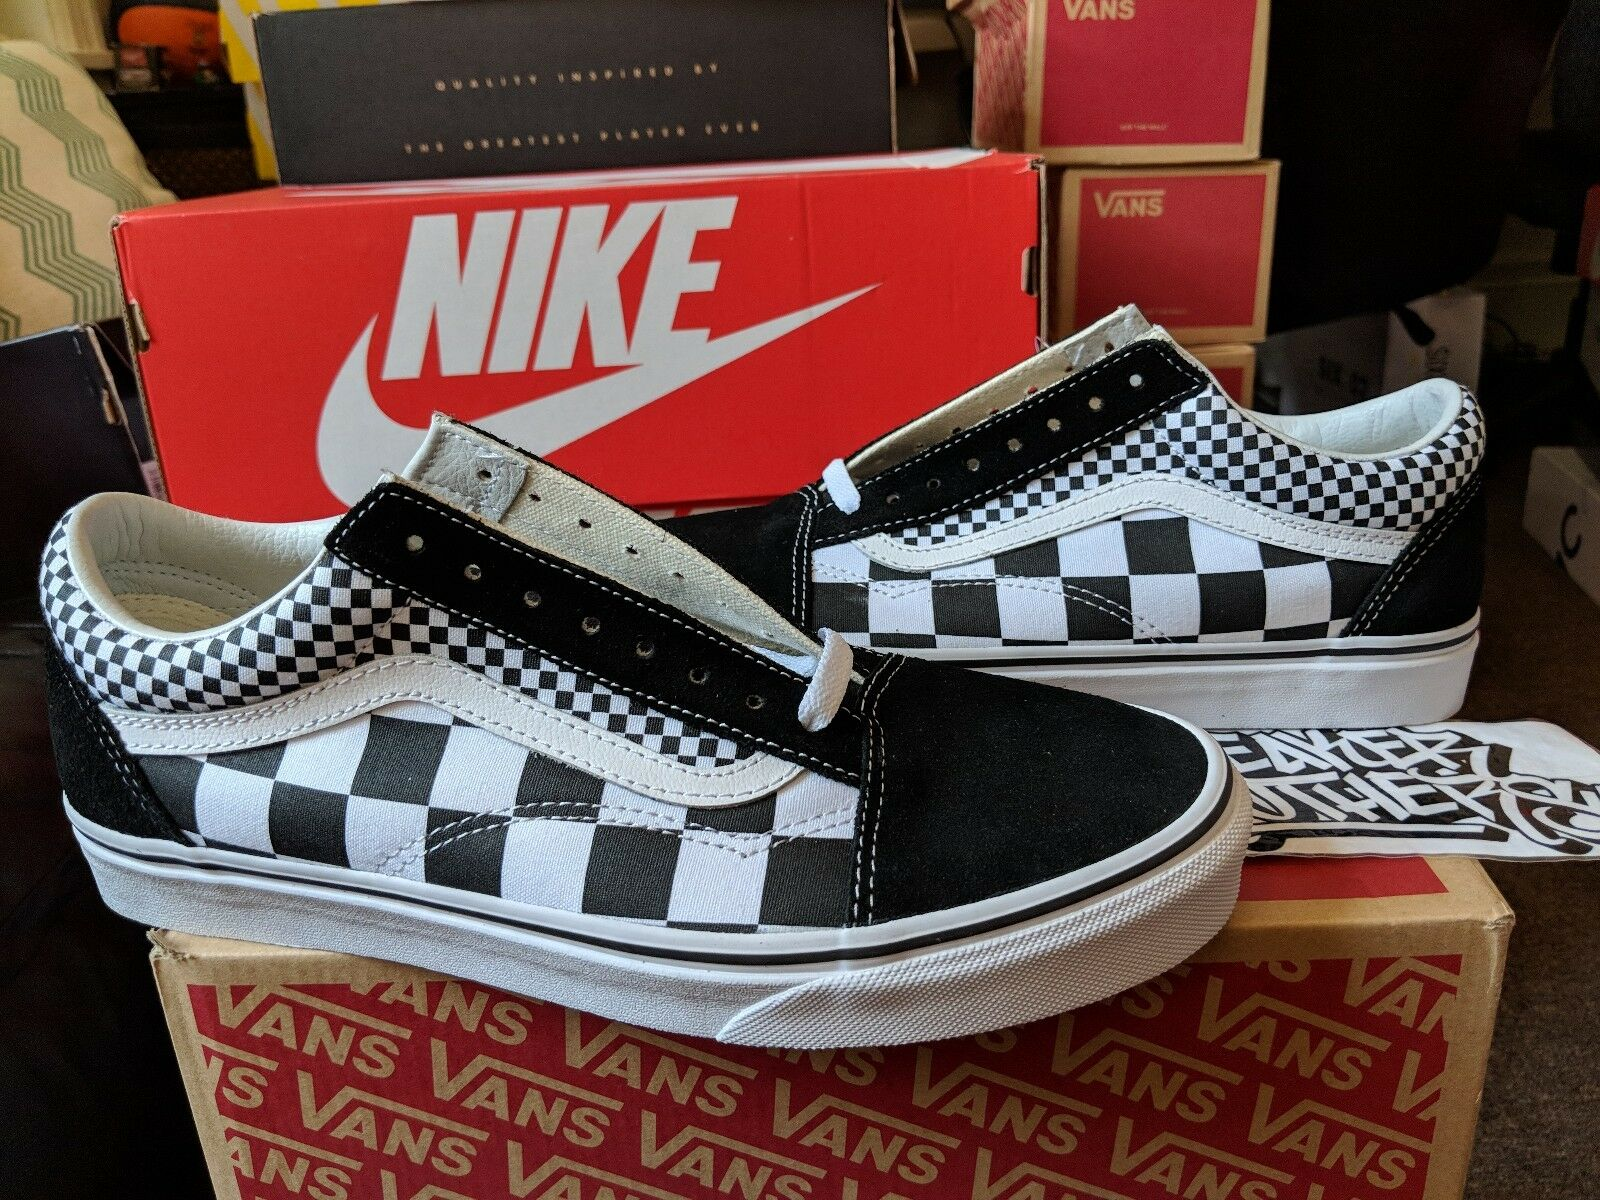 Vans Skool negro blancoo mezcla Checkerboard Old tan verdadero VN0A38G1Q9B fuera del Wall